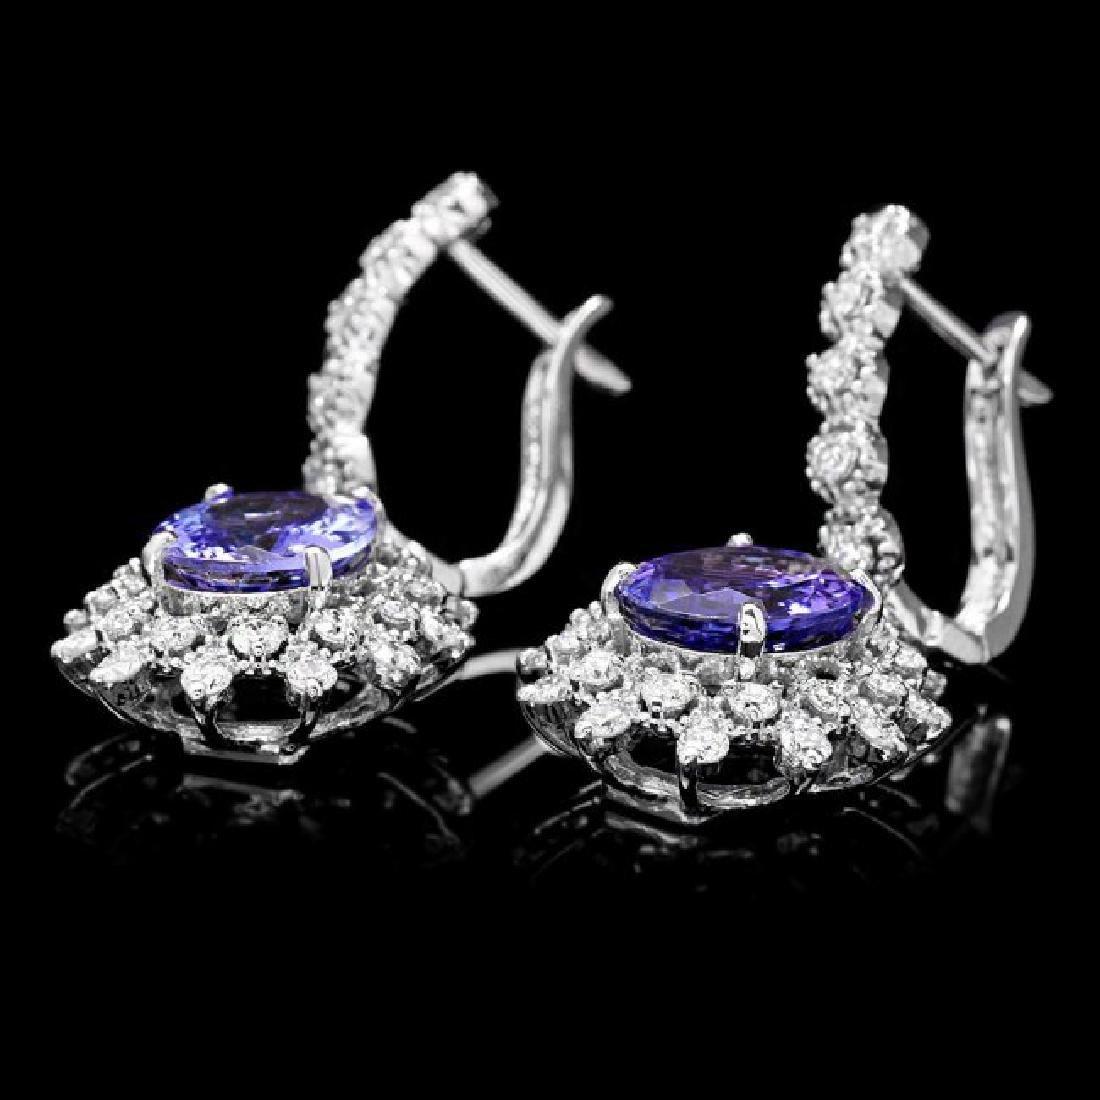 14k Gold 5ct Tanzanite 1.60ct Diamond Earrings - 3